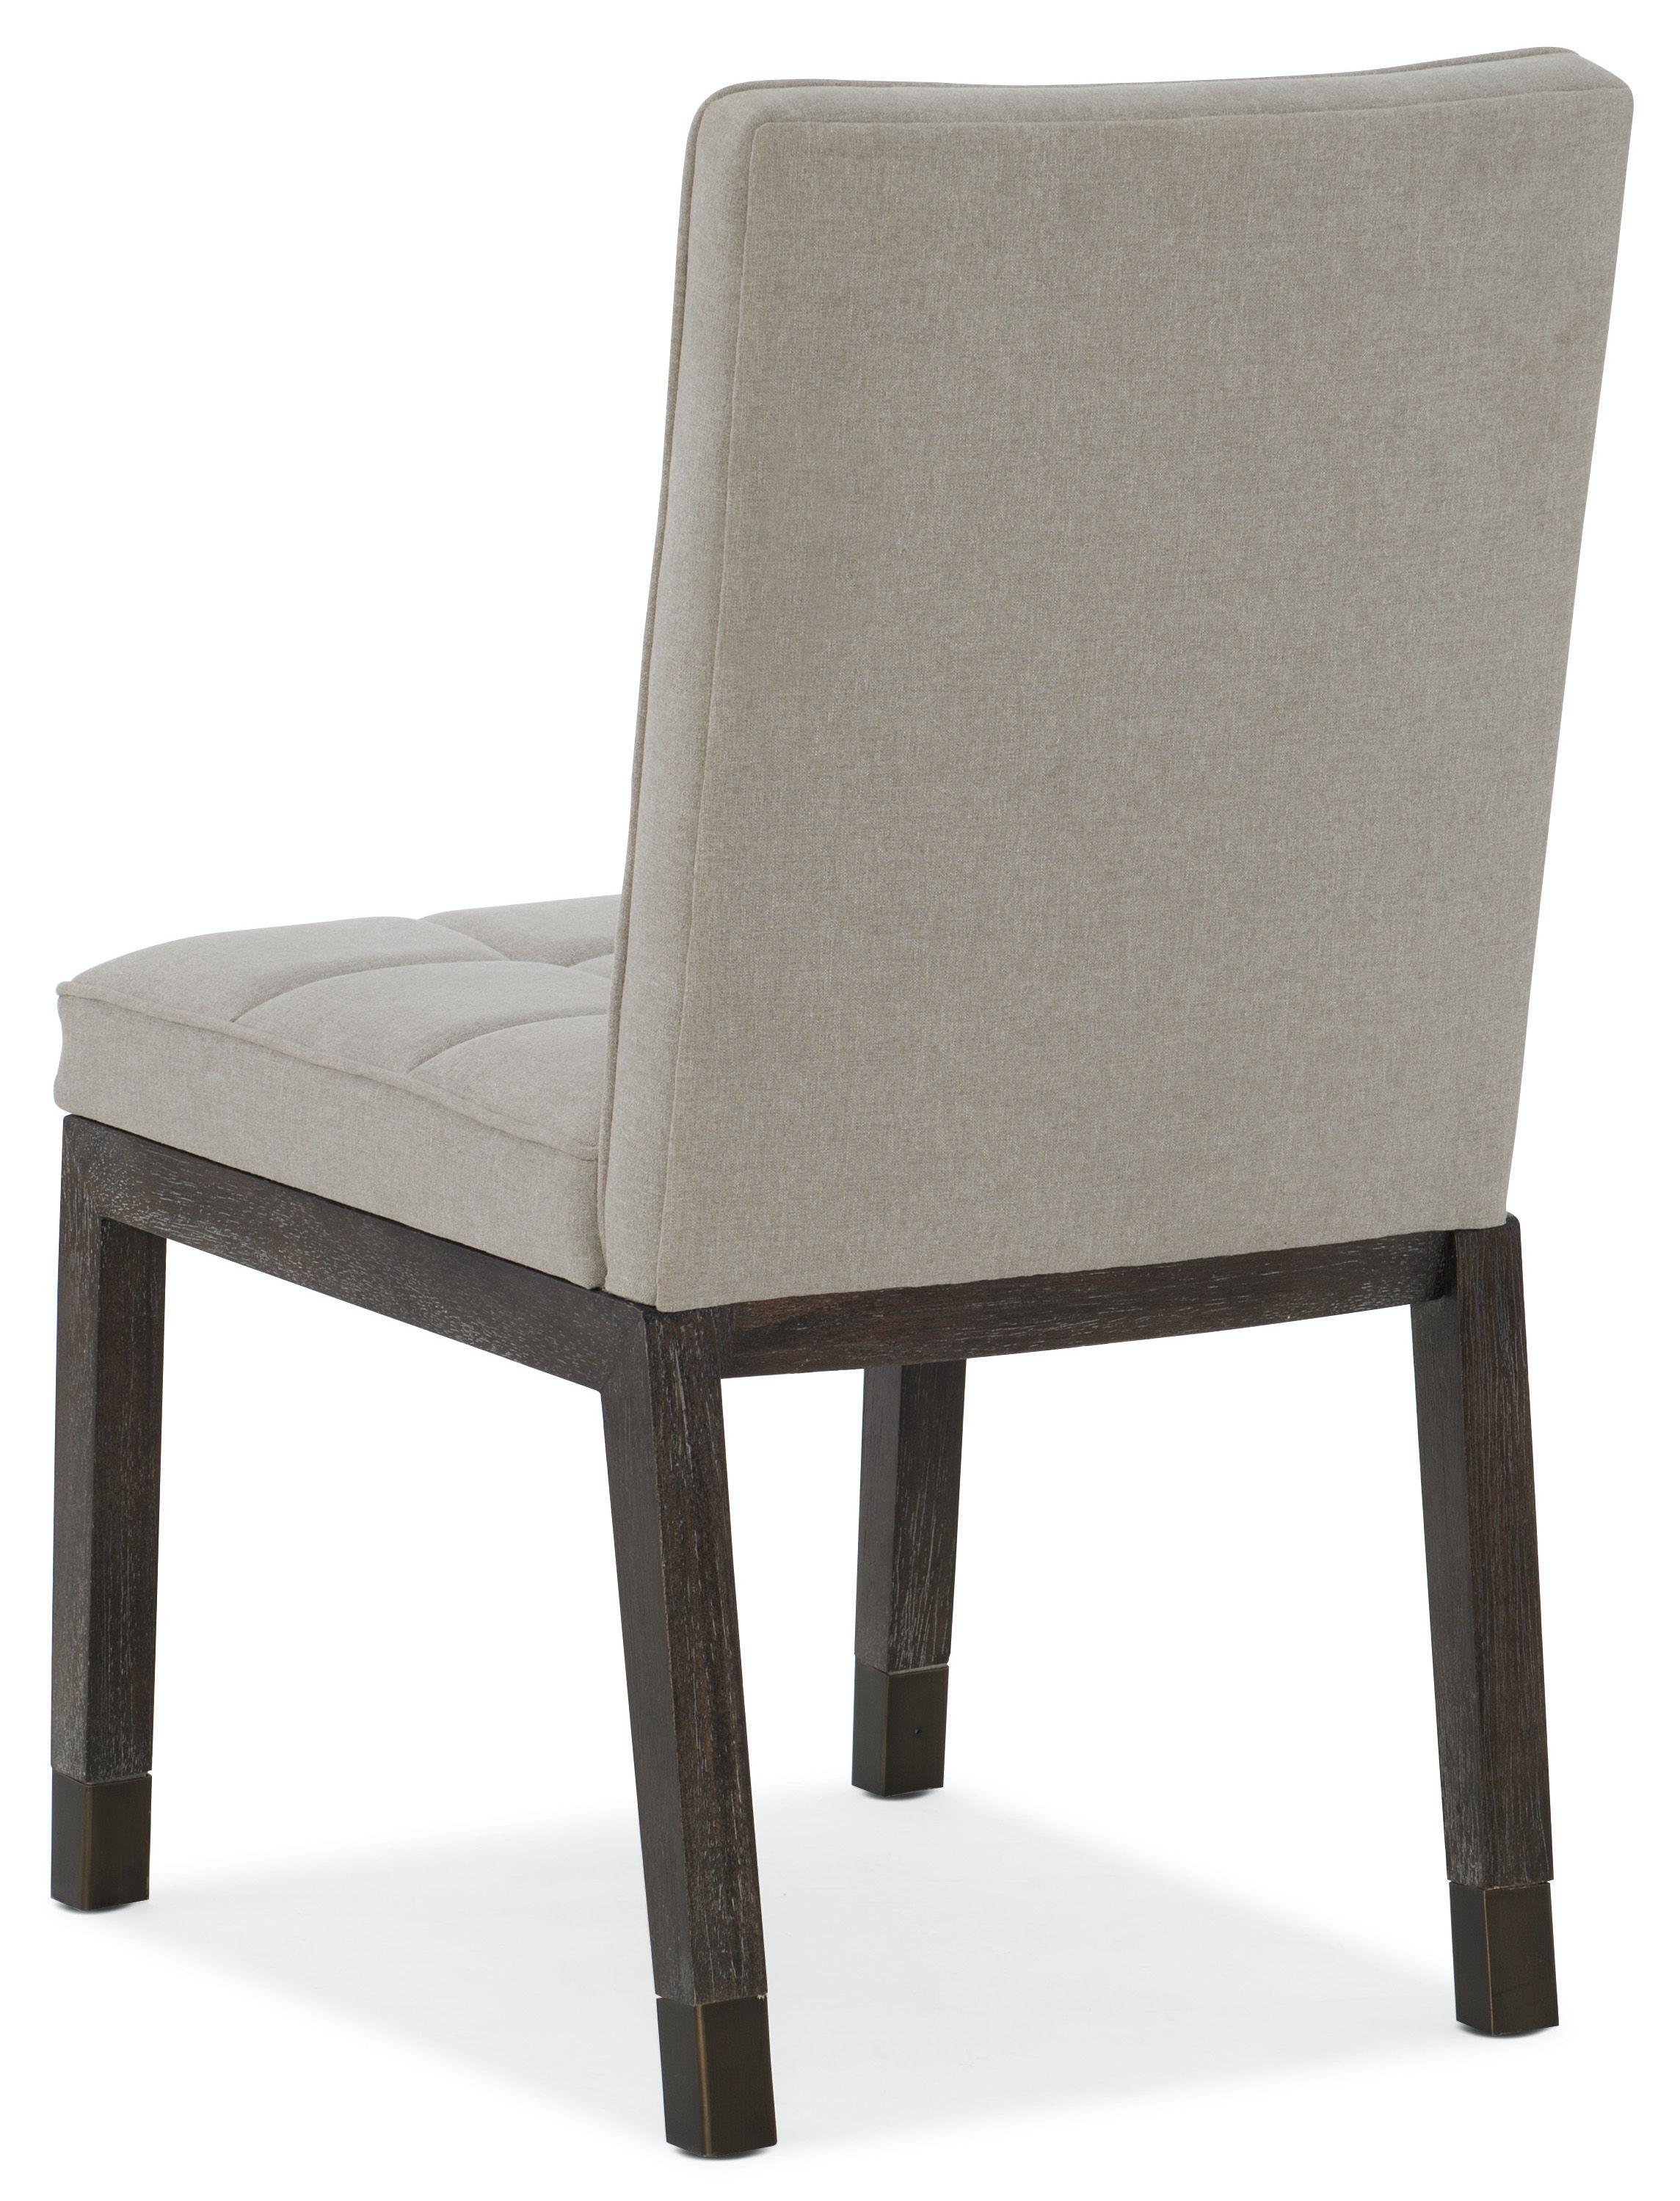 Charmant Hooker Furniture Miramar Aventura Cupertino Upholstered Side Chair  6202 75410 DKW